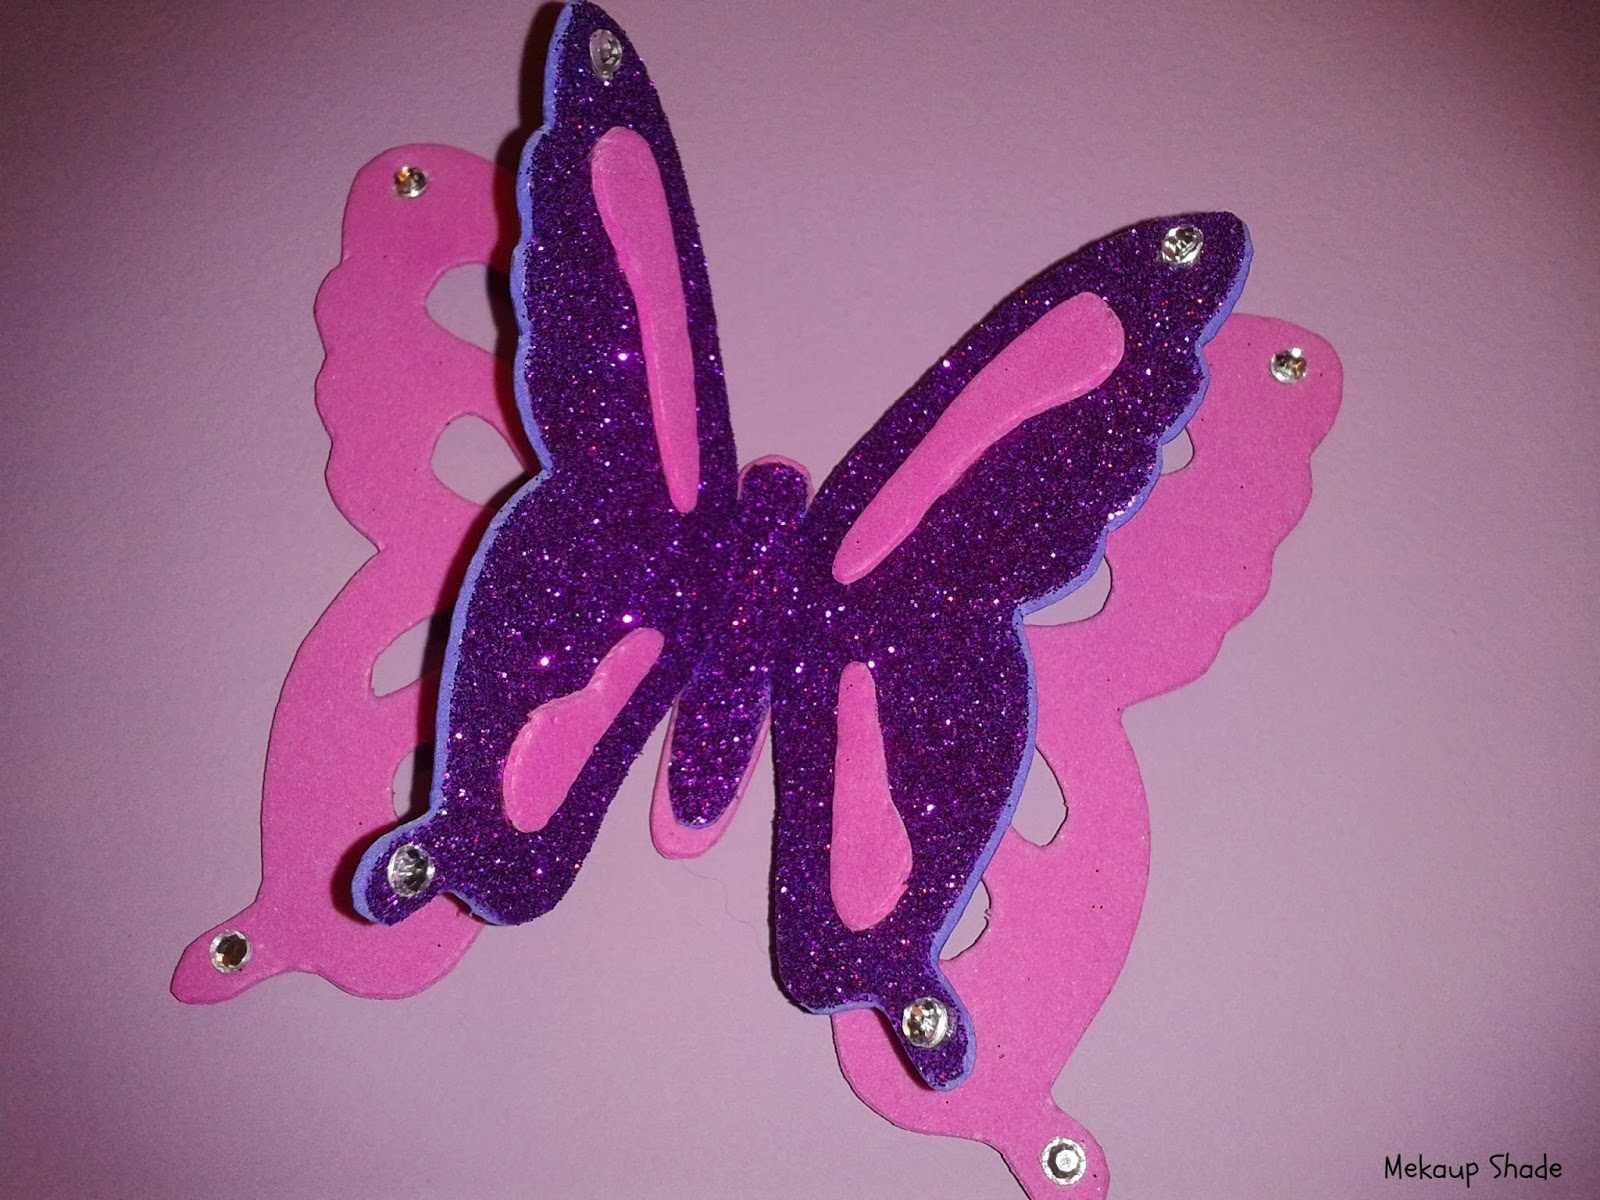 Como hacer mariposas de goma eva imagui - Como hacer mariposas de goma eva ...